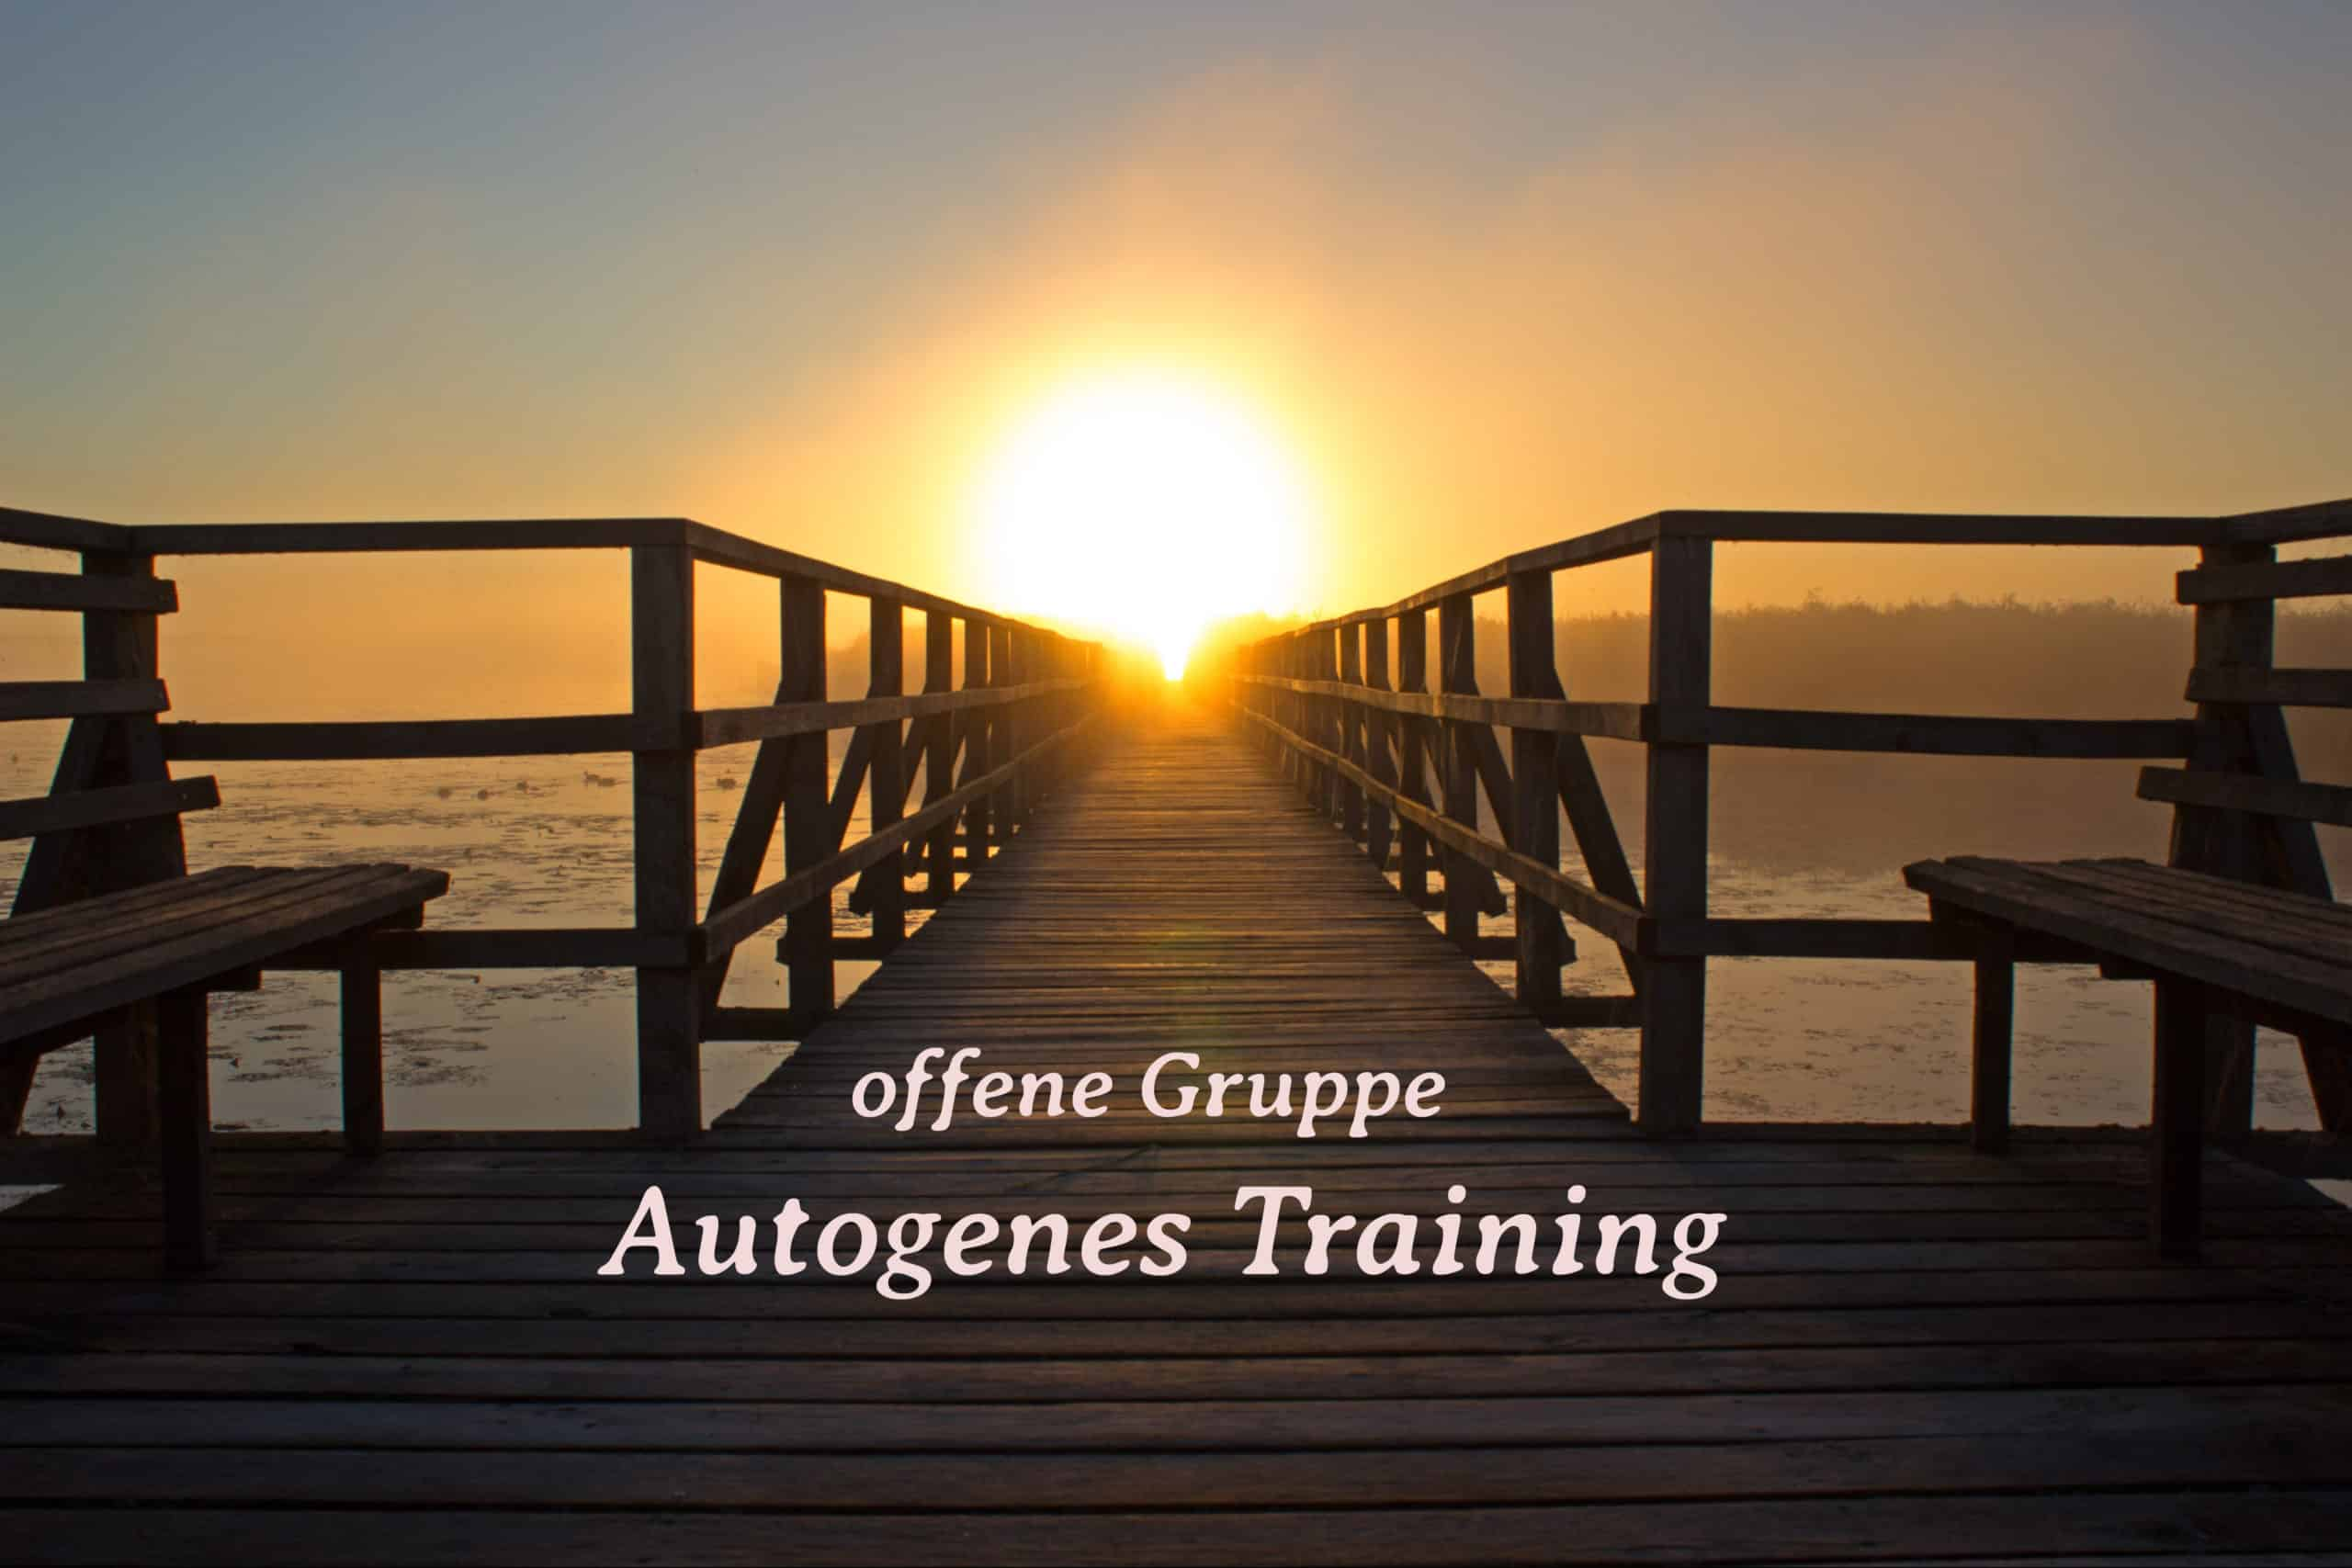 Entspannungszeit Leipzig Kurstermine Autogenes Training, Yoga Nidra